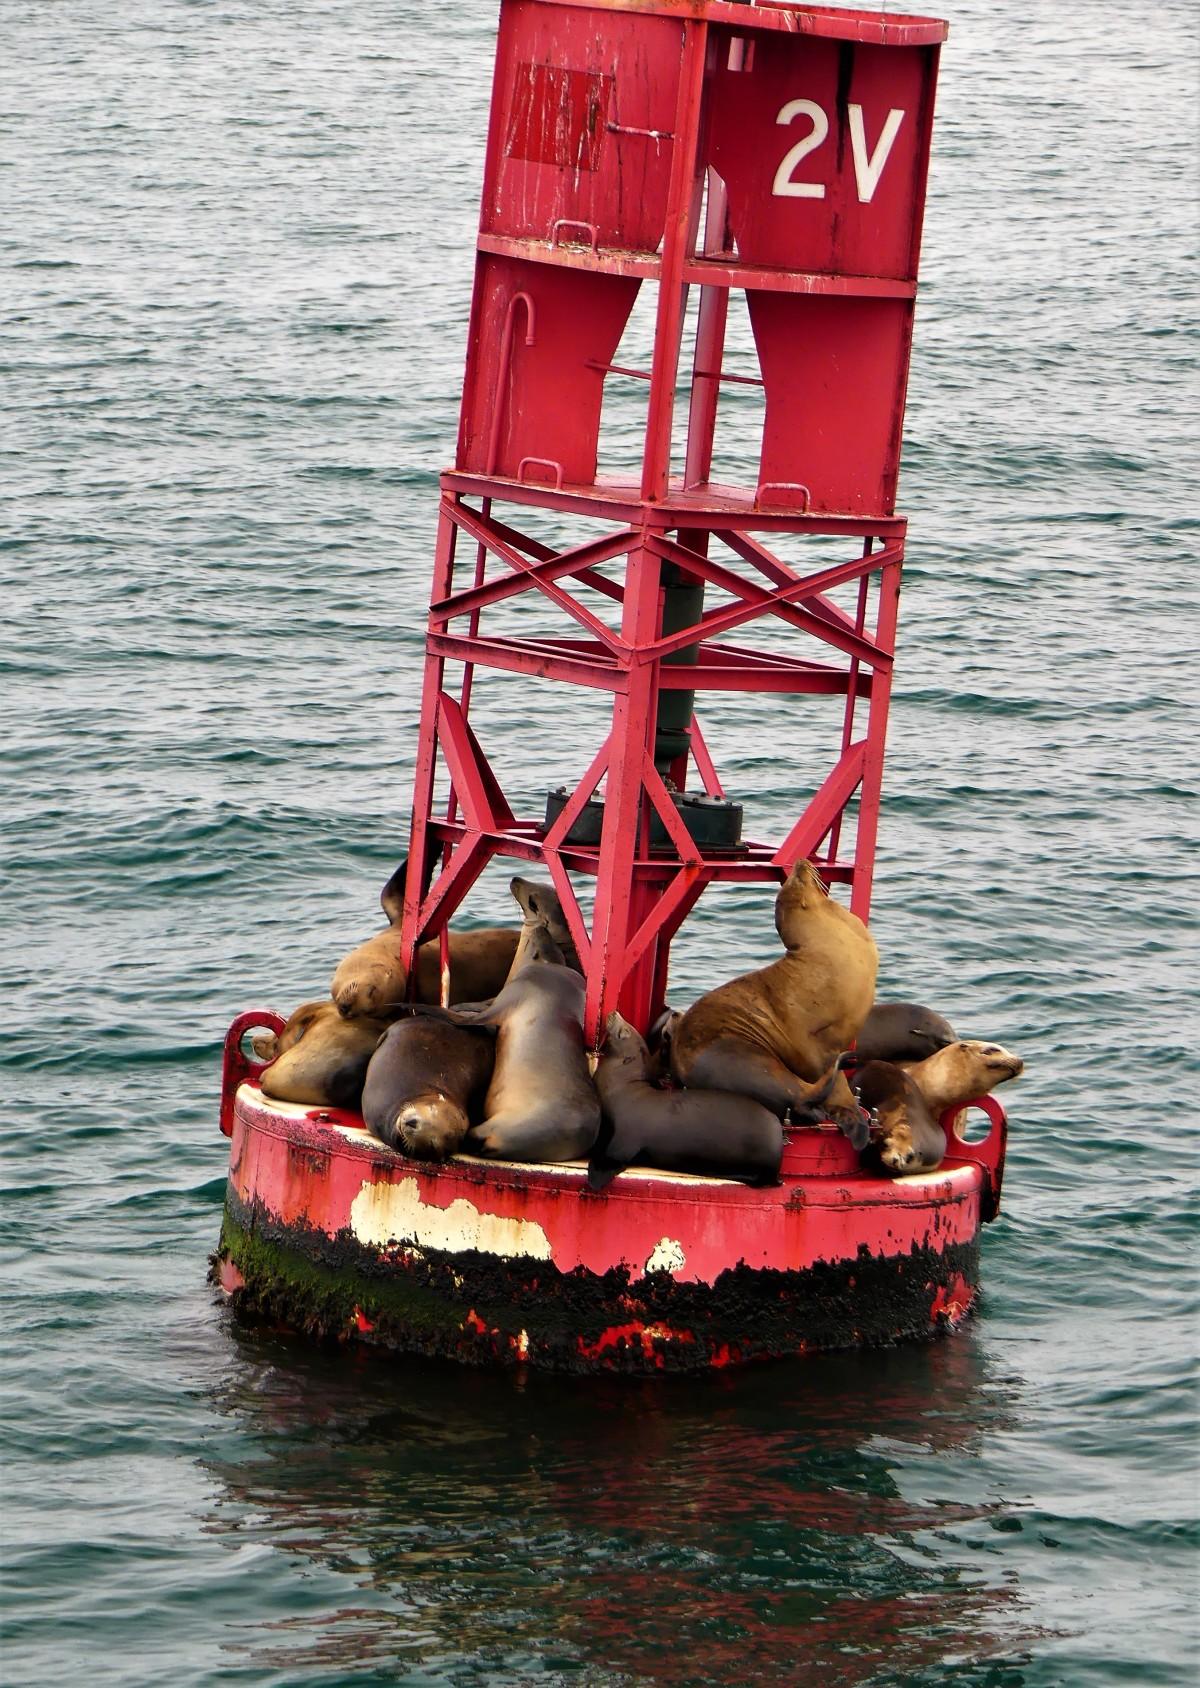 hauling on a buoy